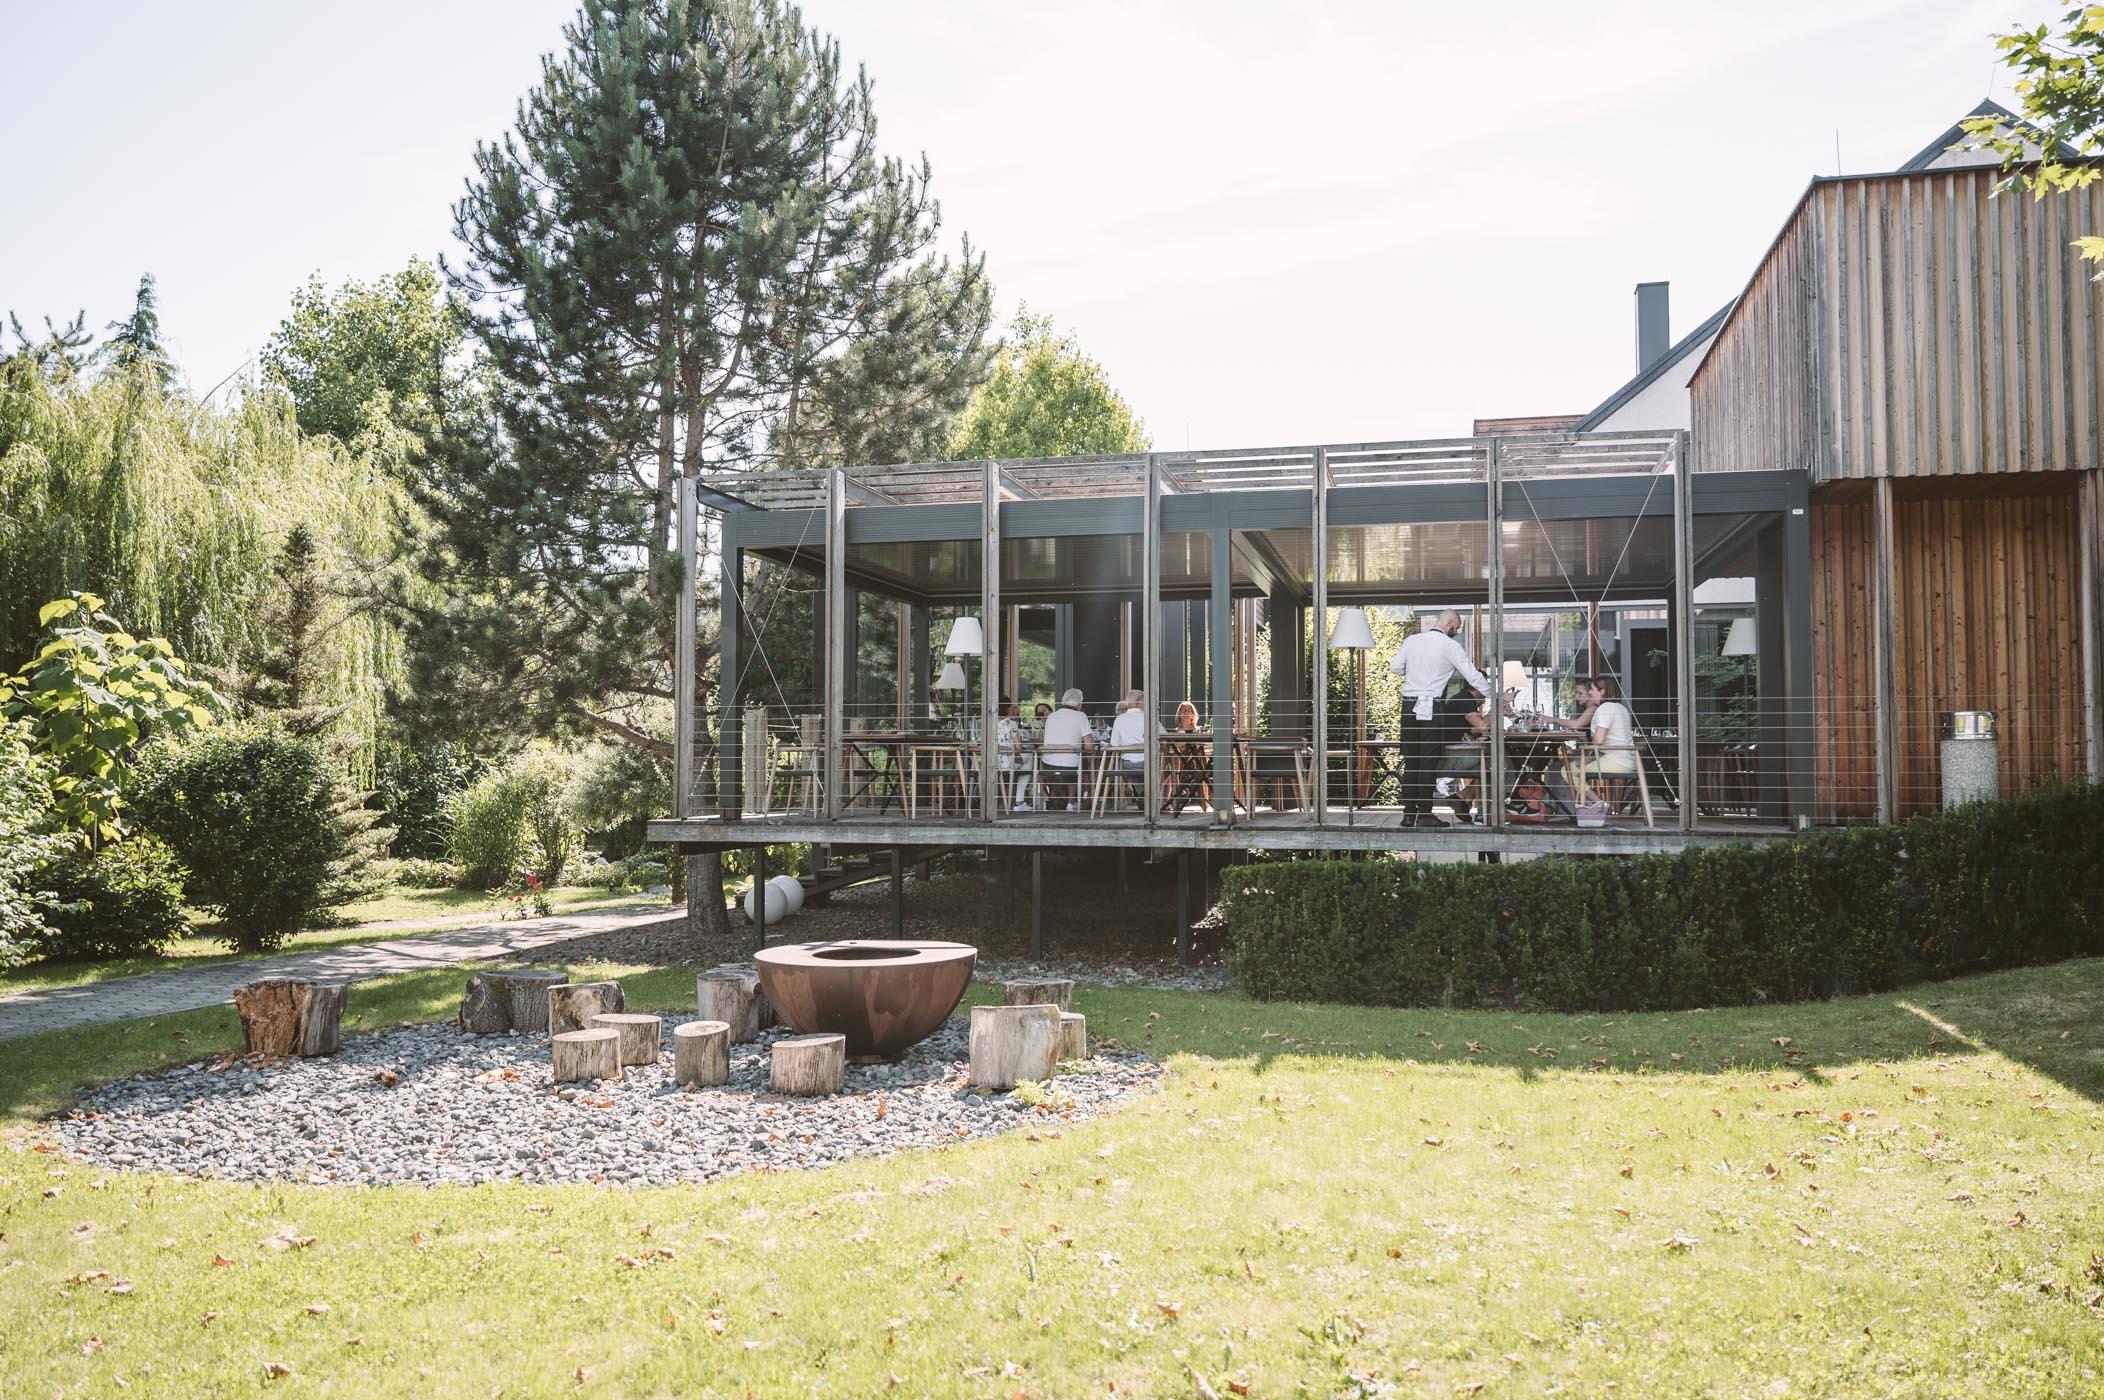 Hiša Denk restaurant in Slovenia